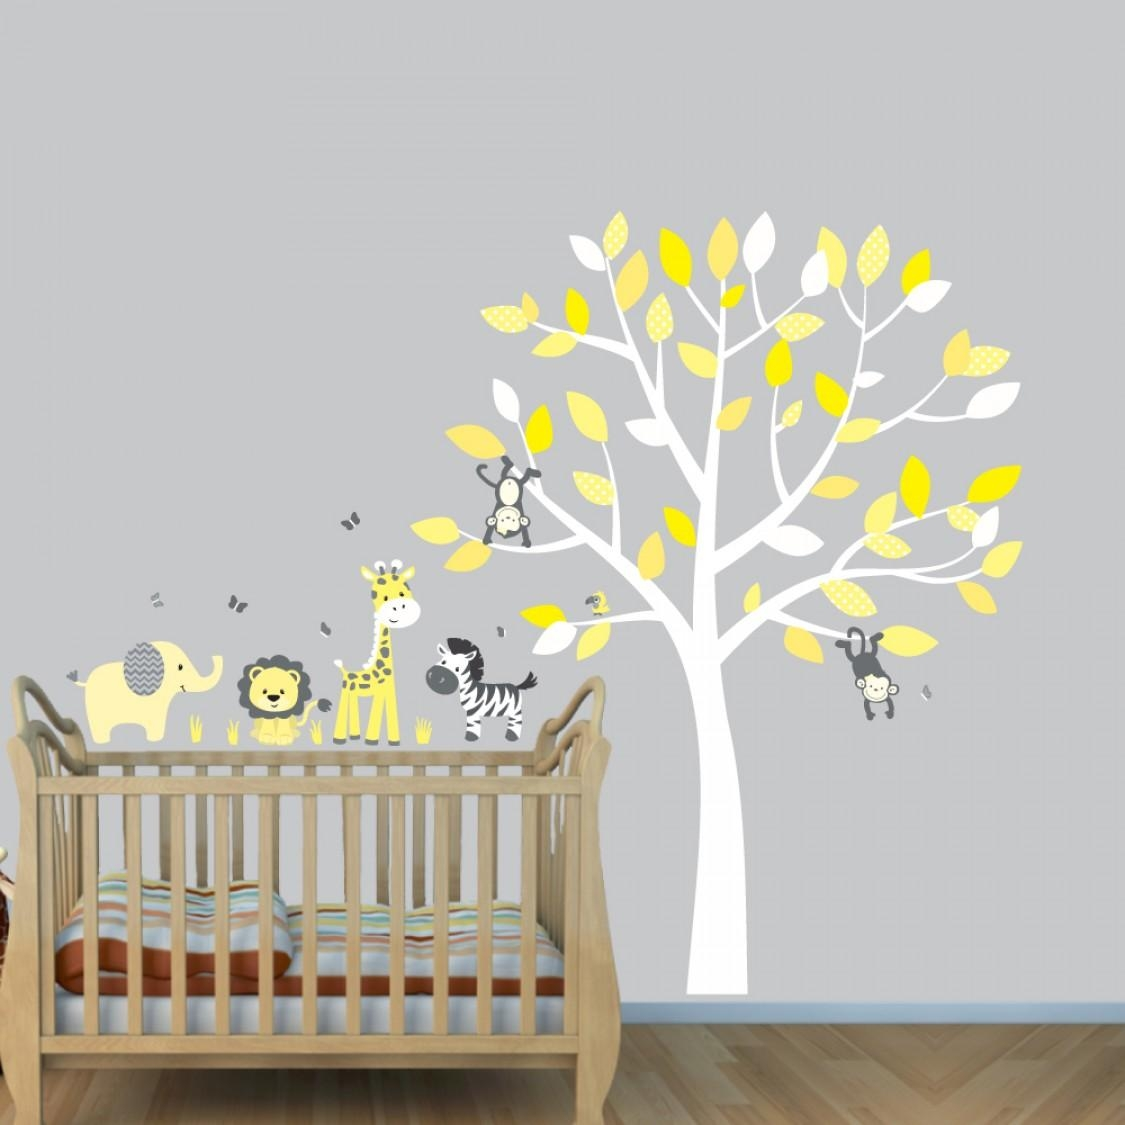 Wall Art: Glamorous Yellow And Grey Wall Art Yellow And Gray For Glamorous Wall Art (View 5 of 20)